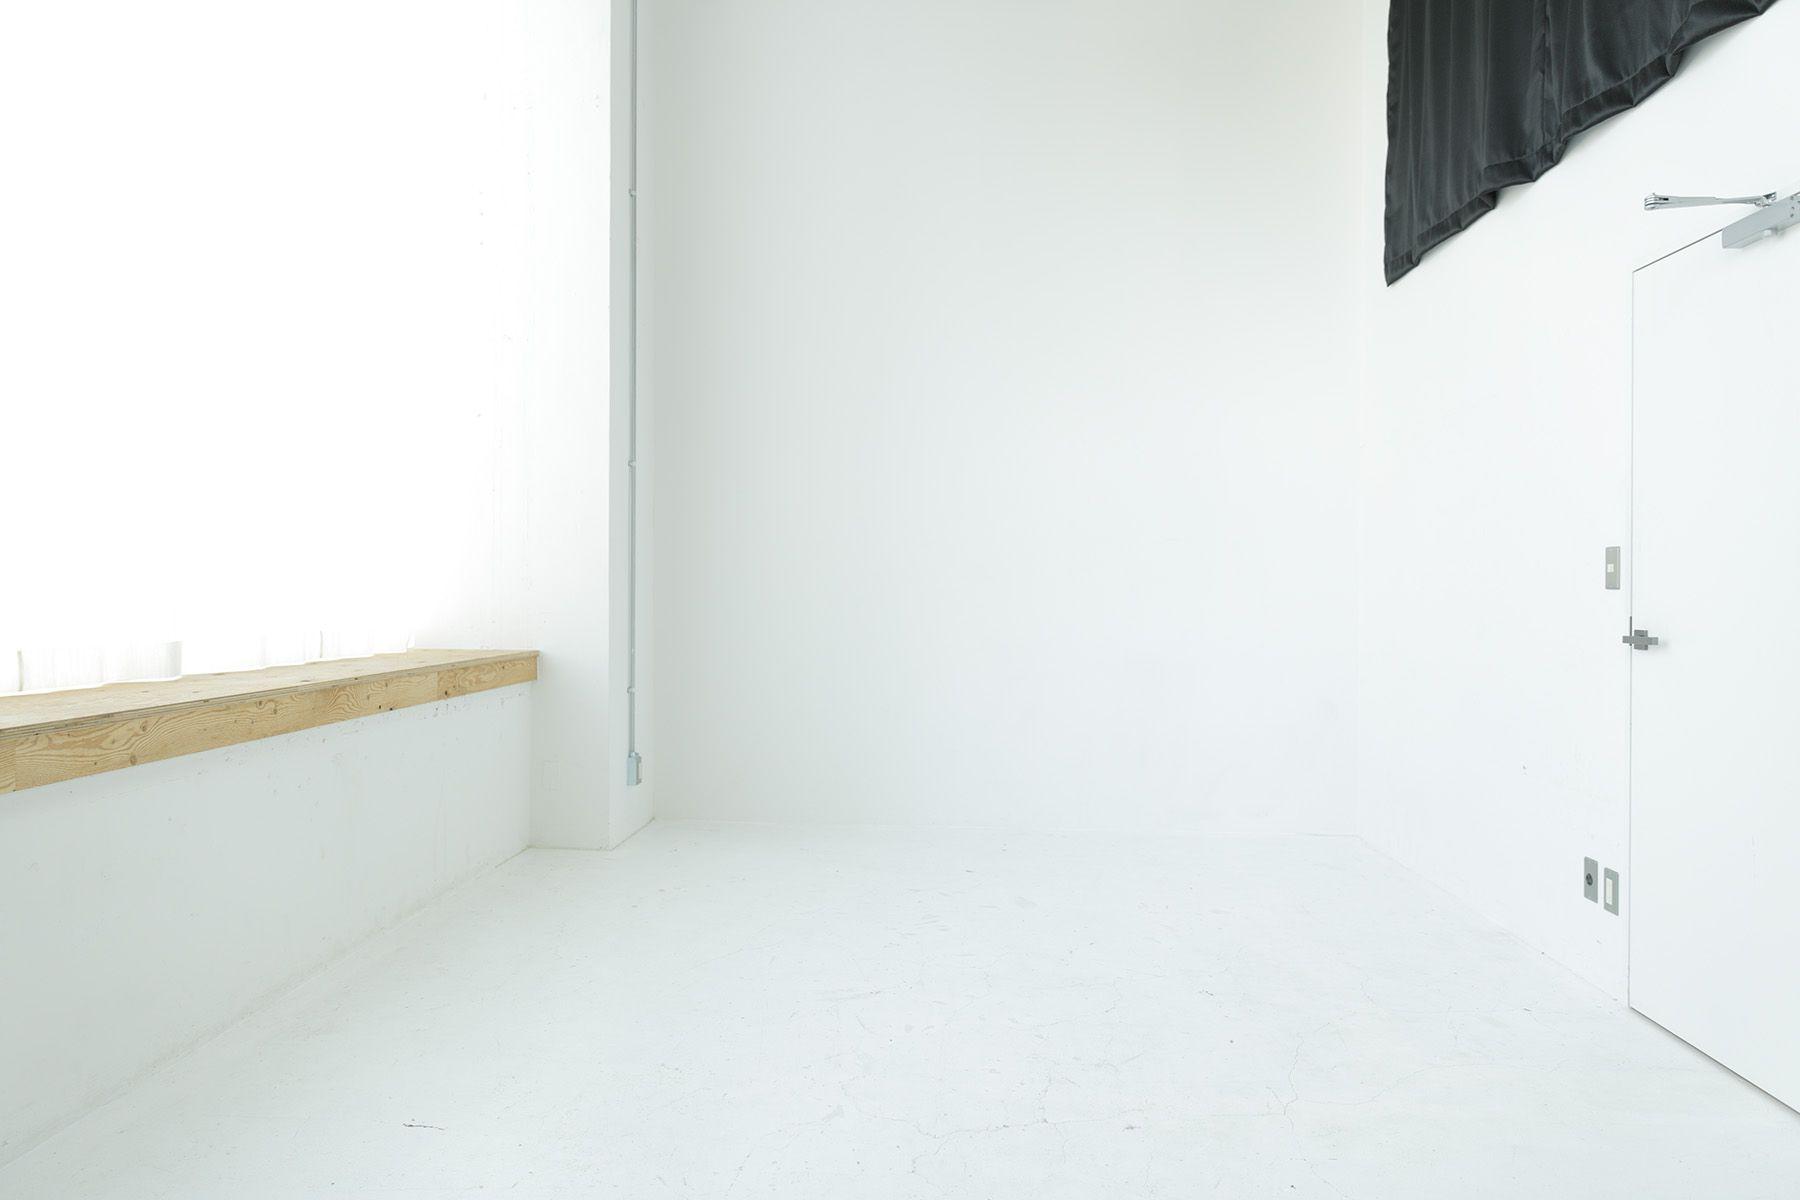 Studio Roaster (スタジオ ロースター)studio